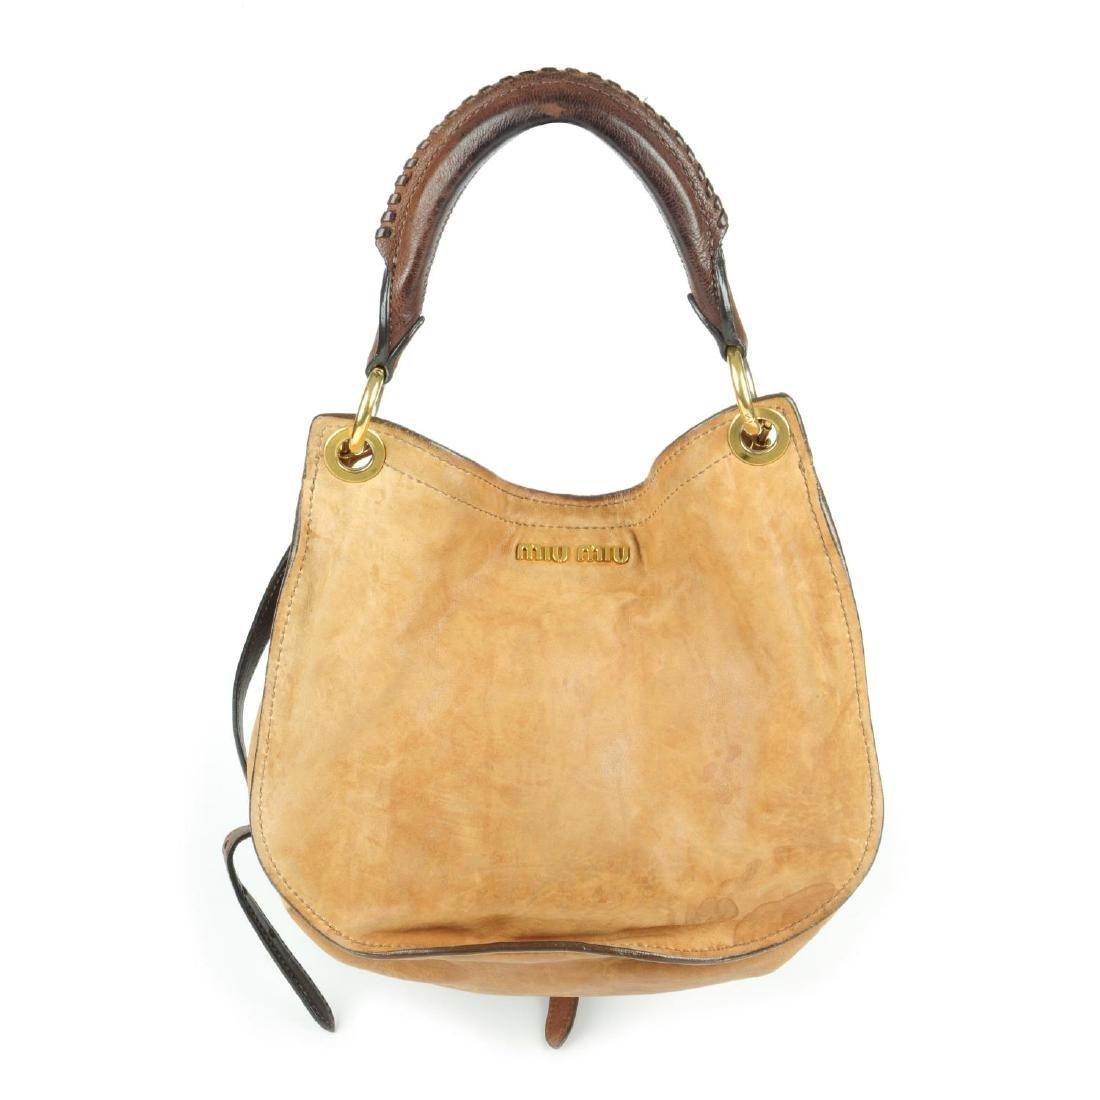 MIU MIU - a leather saddle handbag. Designed with a tan